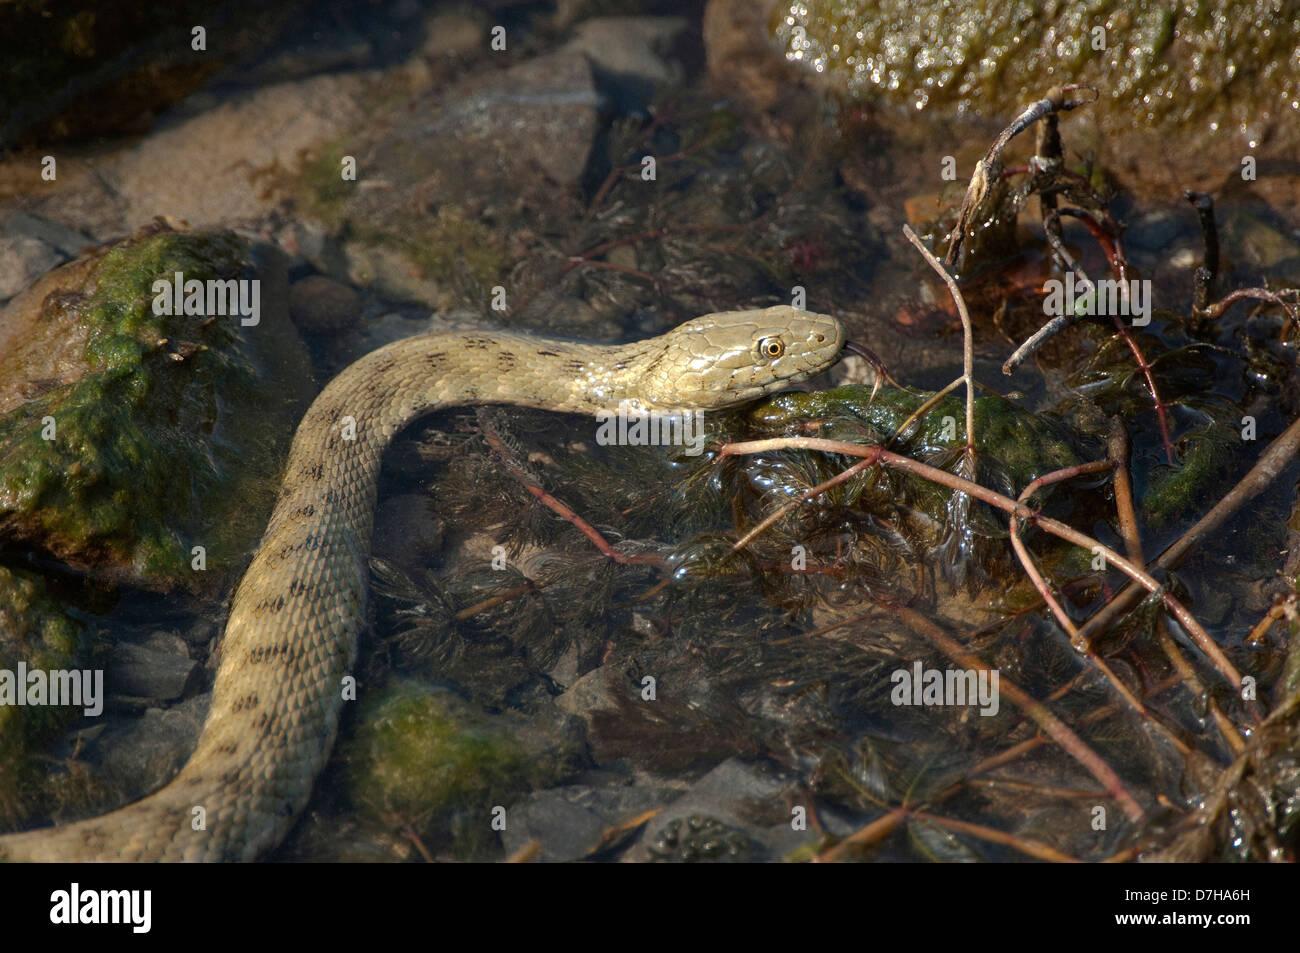 Dice Snake (Natrix tessellata) foraging among aquatic plants - Stock Image